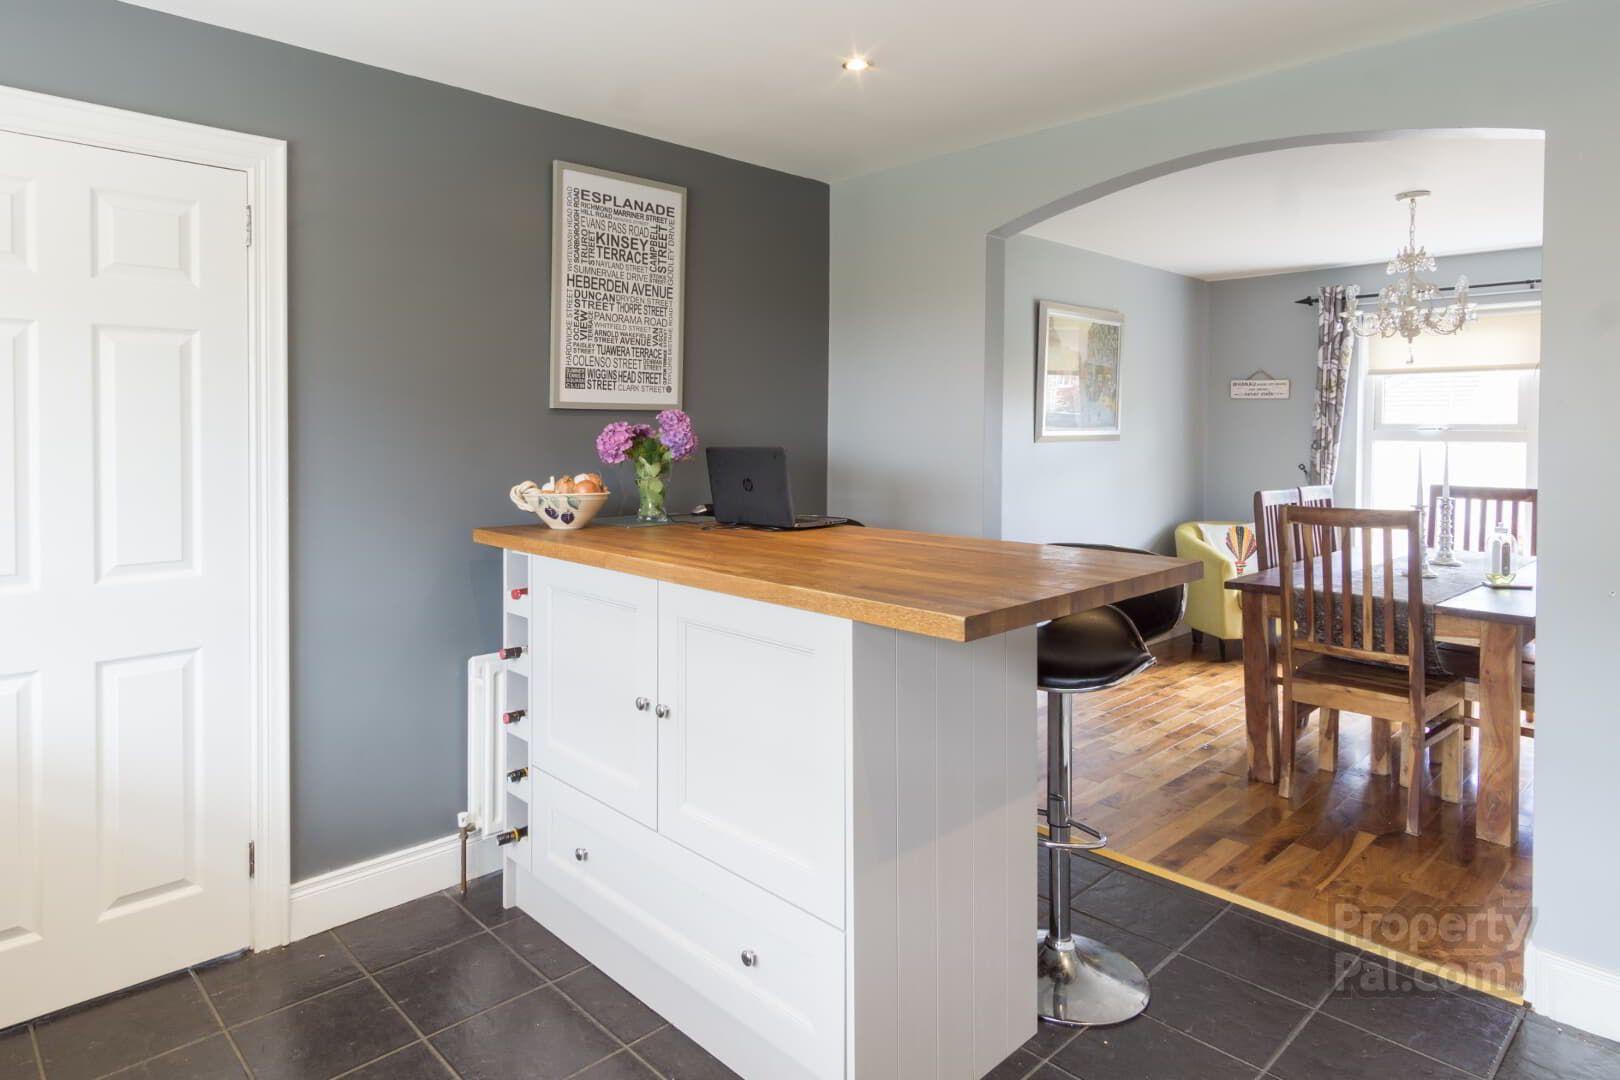 Pin by PropertyPal on Kitchen Islands   Modern kitchen ...